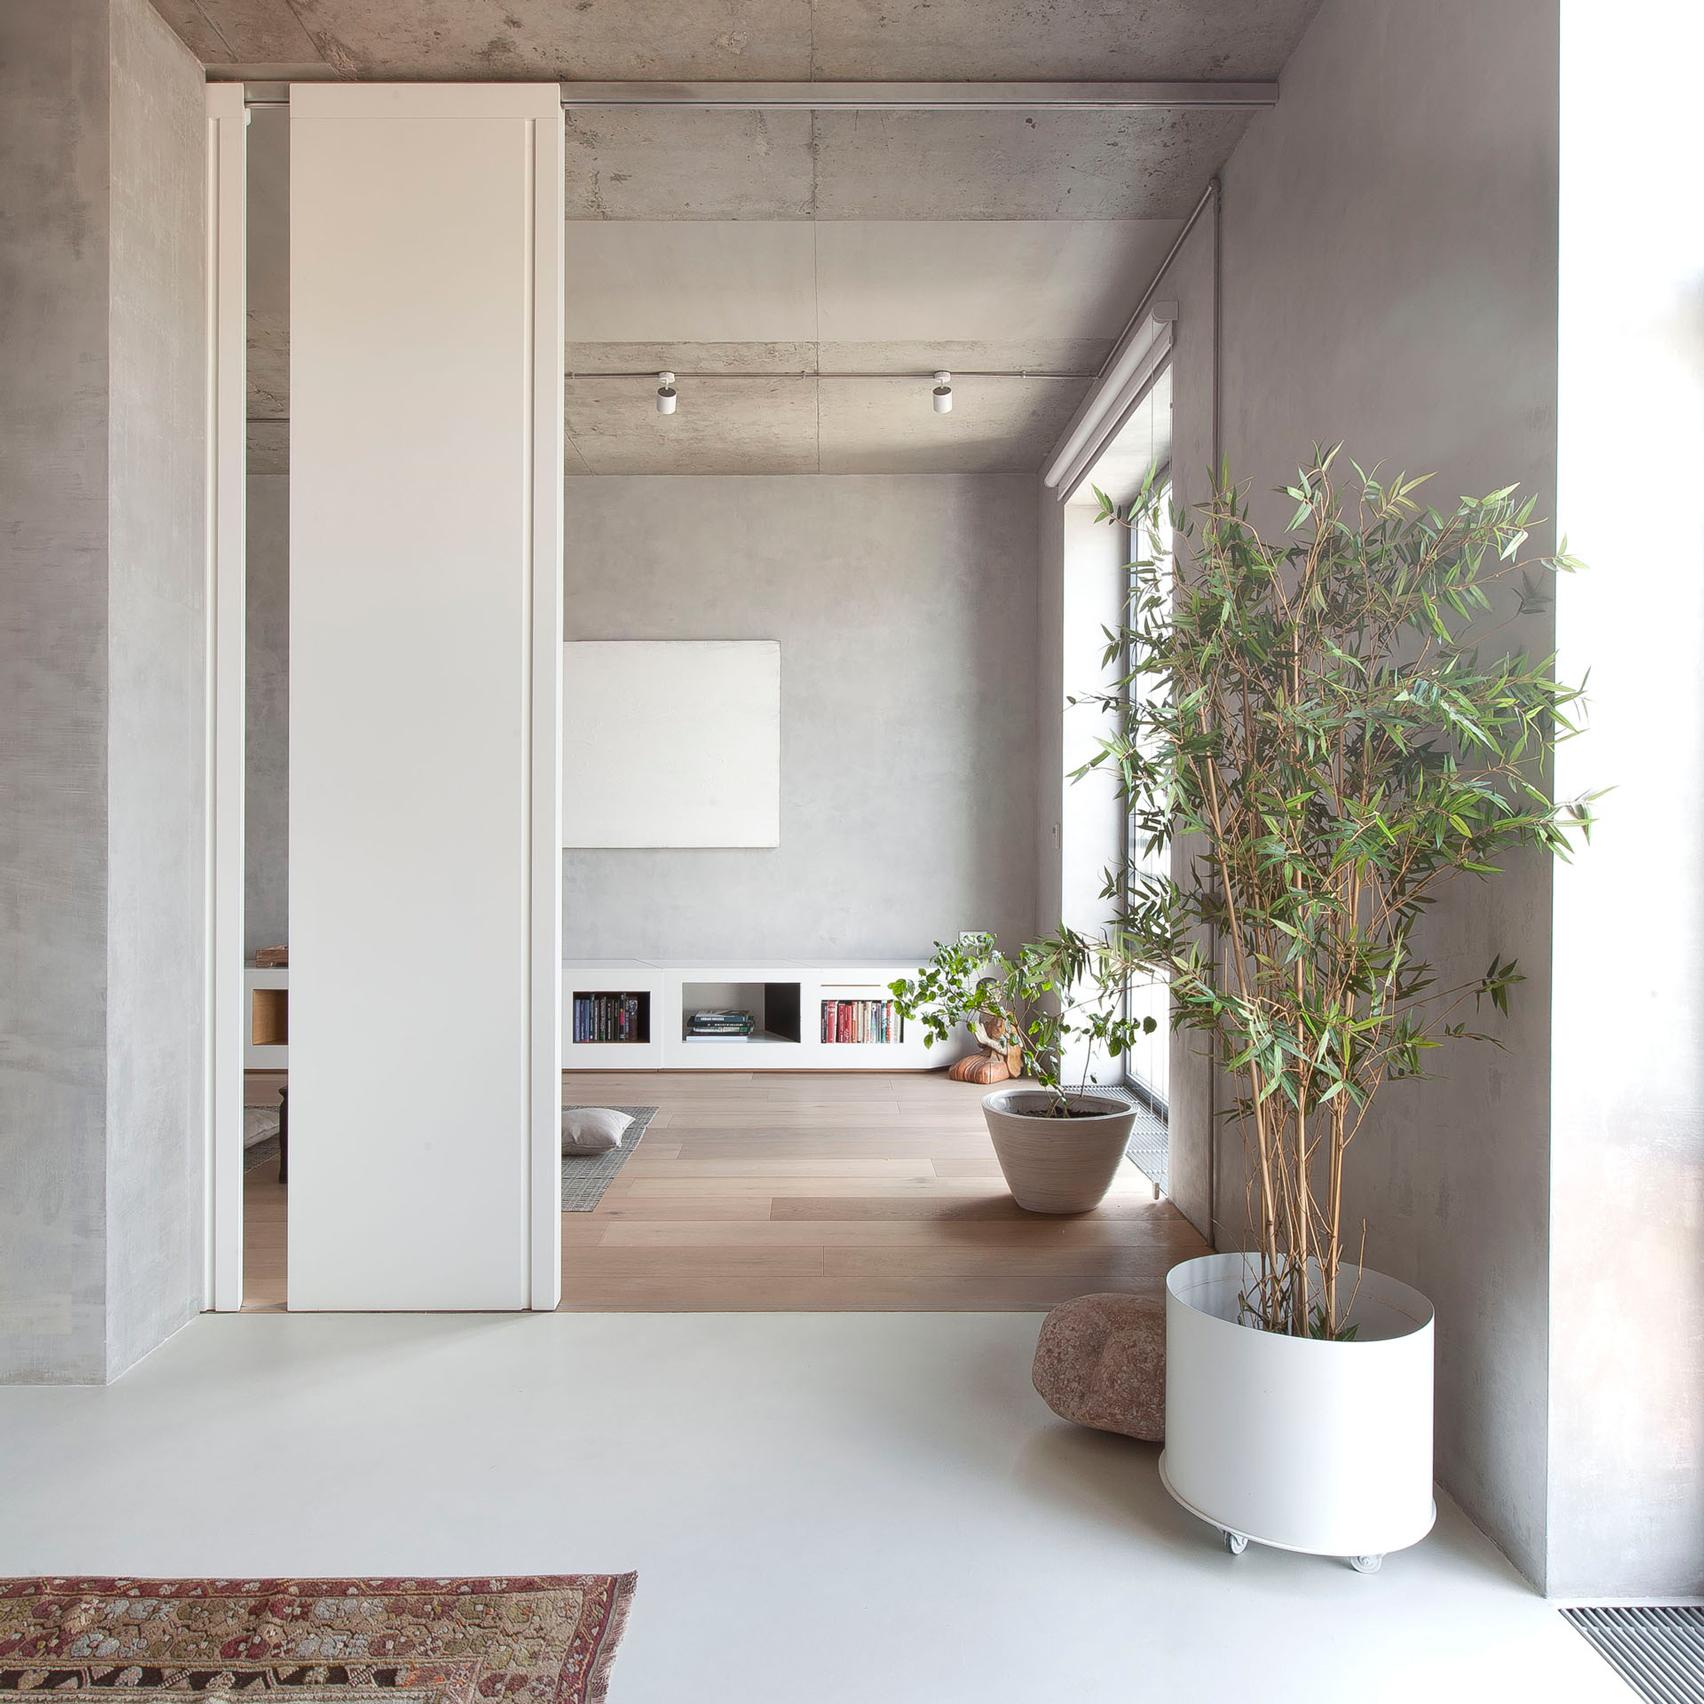 Japanese Interiors 10 Japanesethemed Interiors From Dezeen's Pinterest Boards